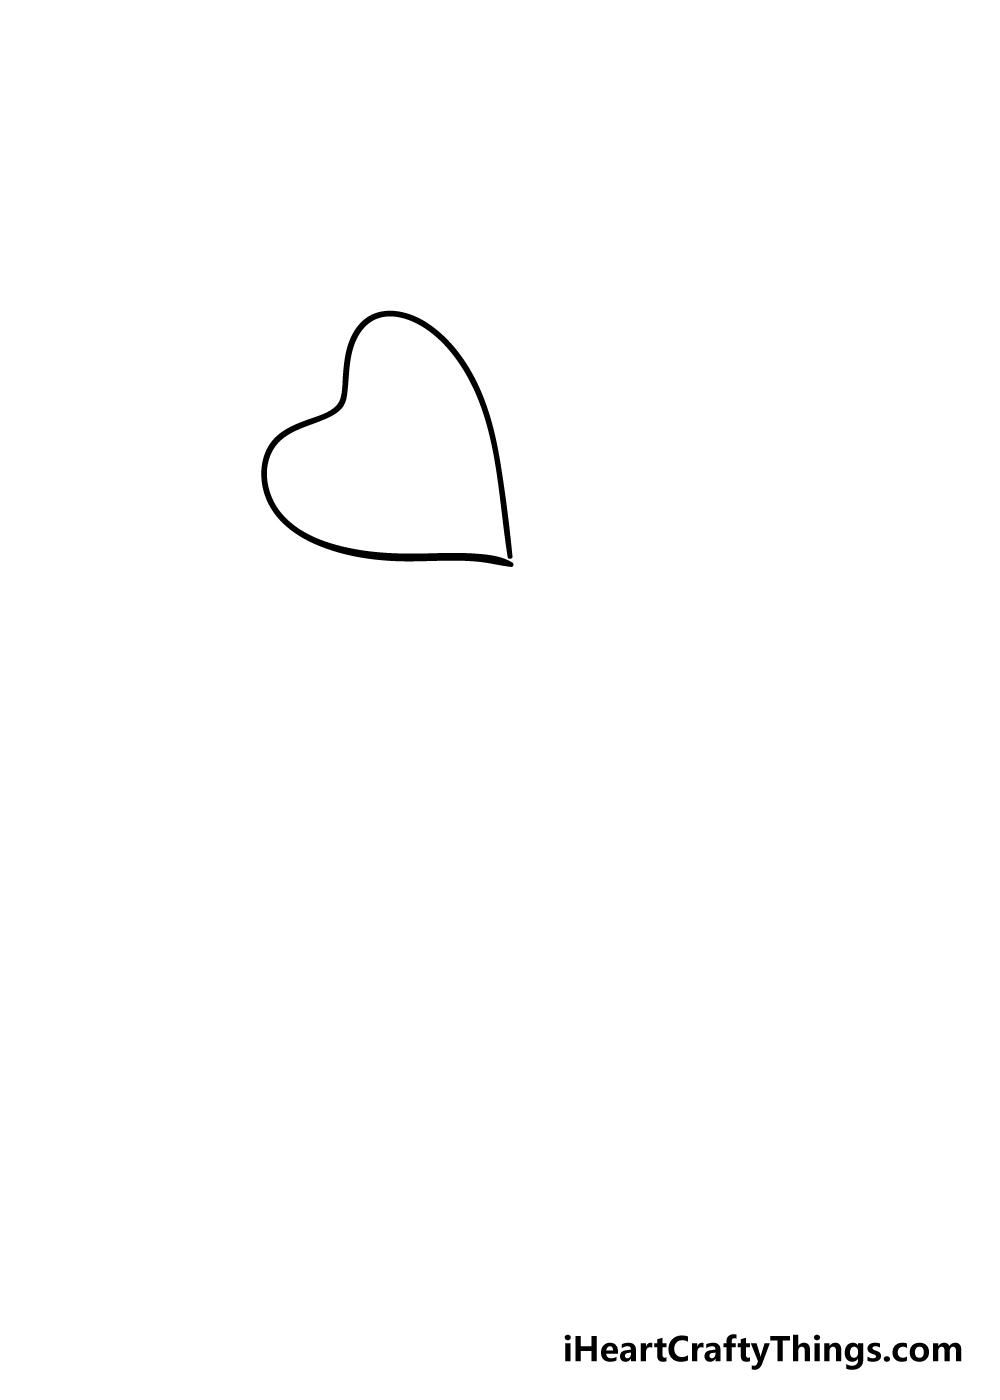 drawing four-leaf clover step 1